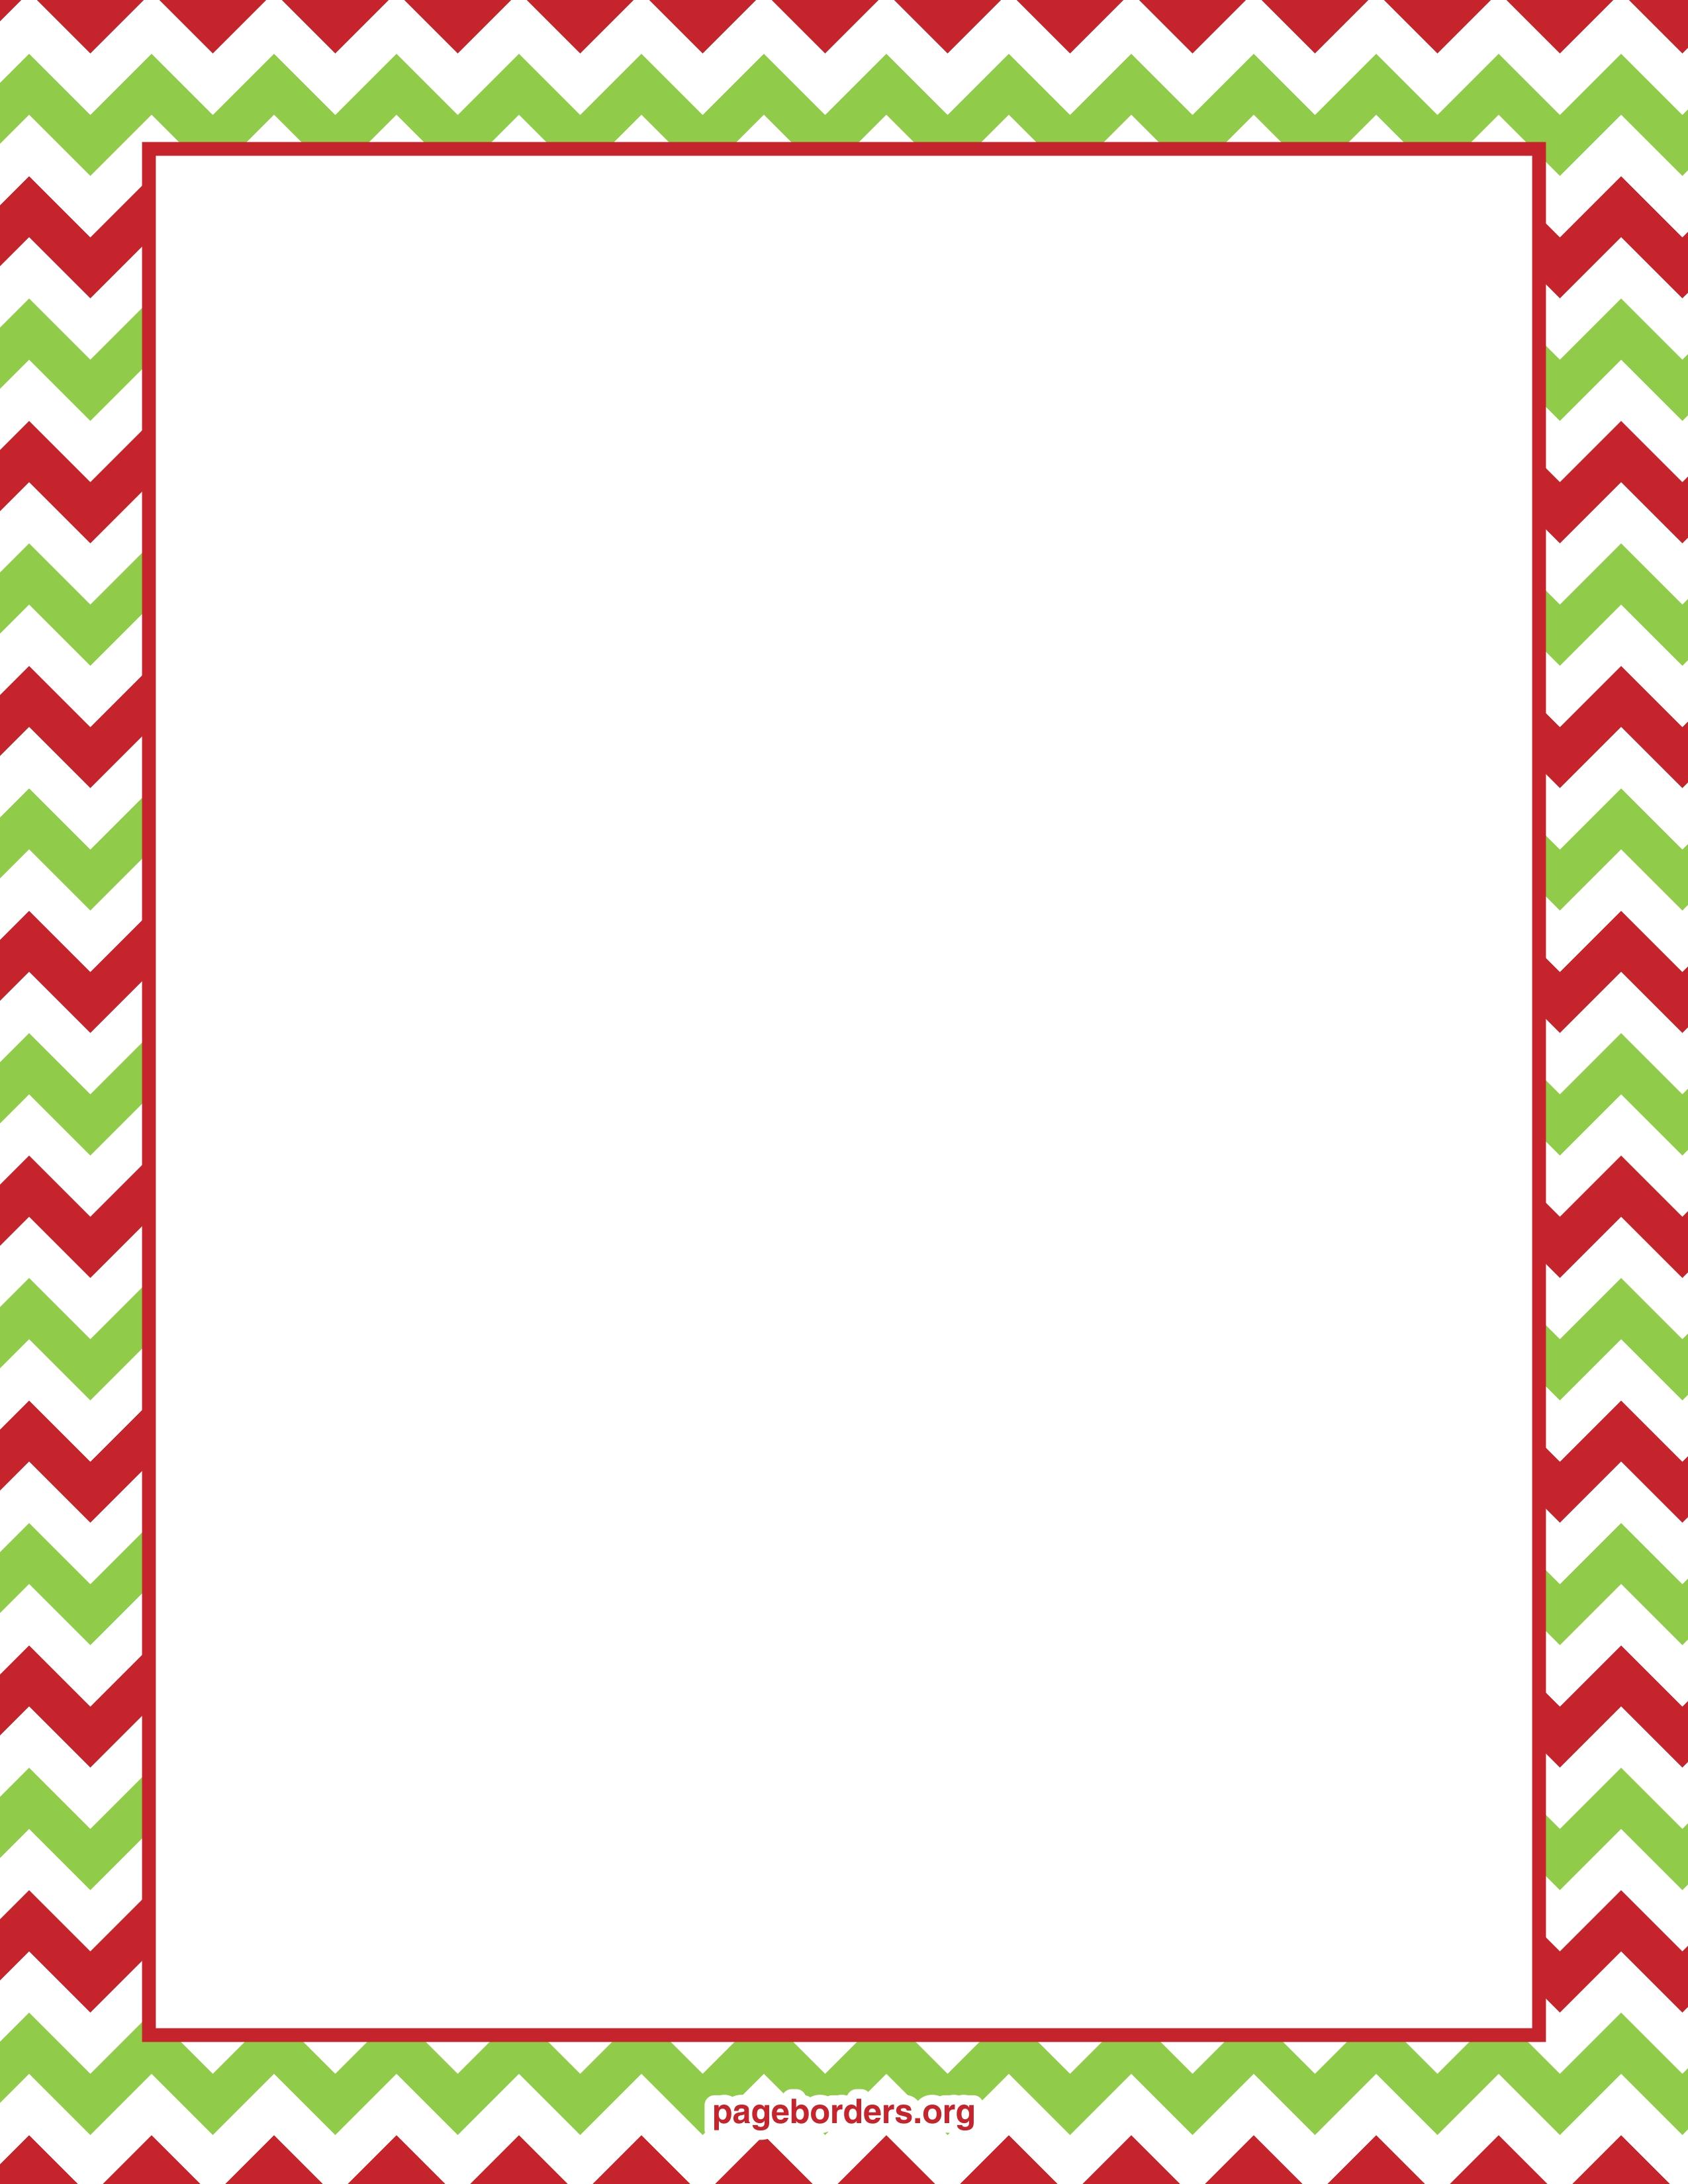 Clipart Chevron Borders Clipa - Free Christmas Borders Clipart